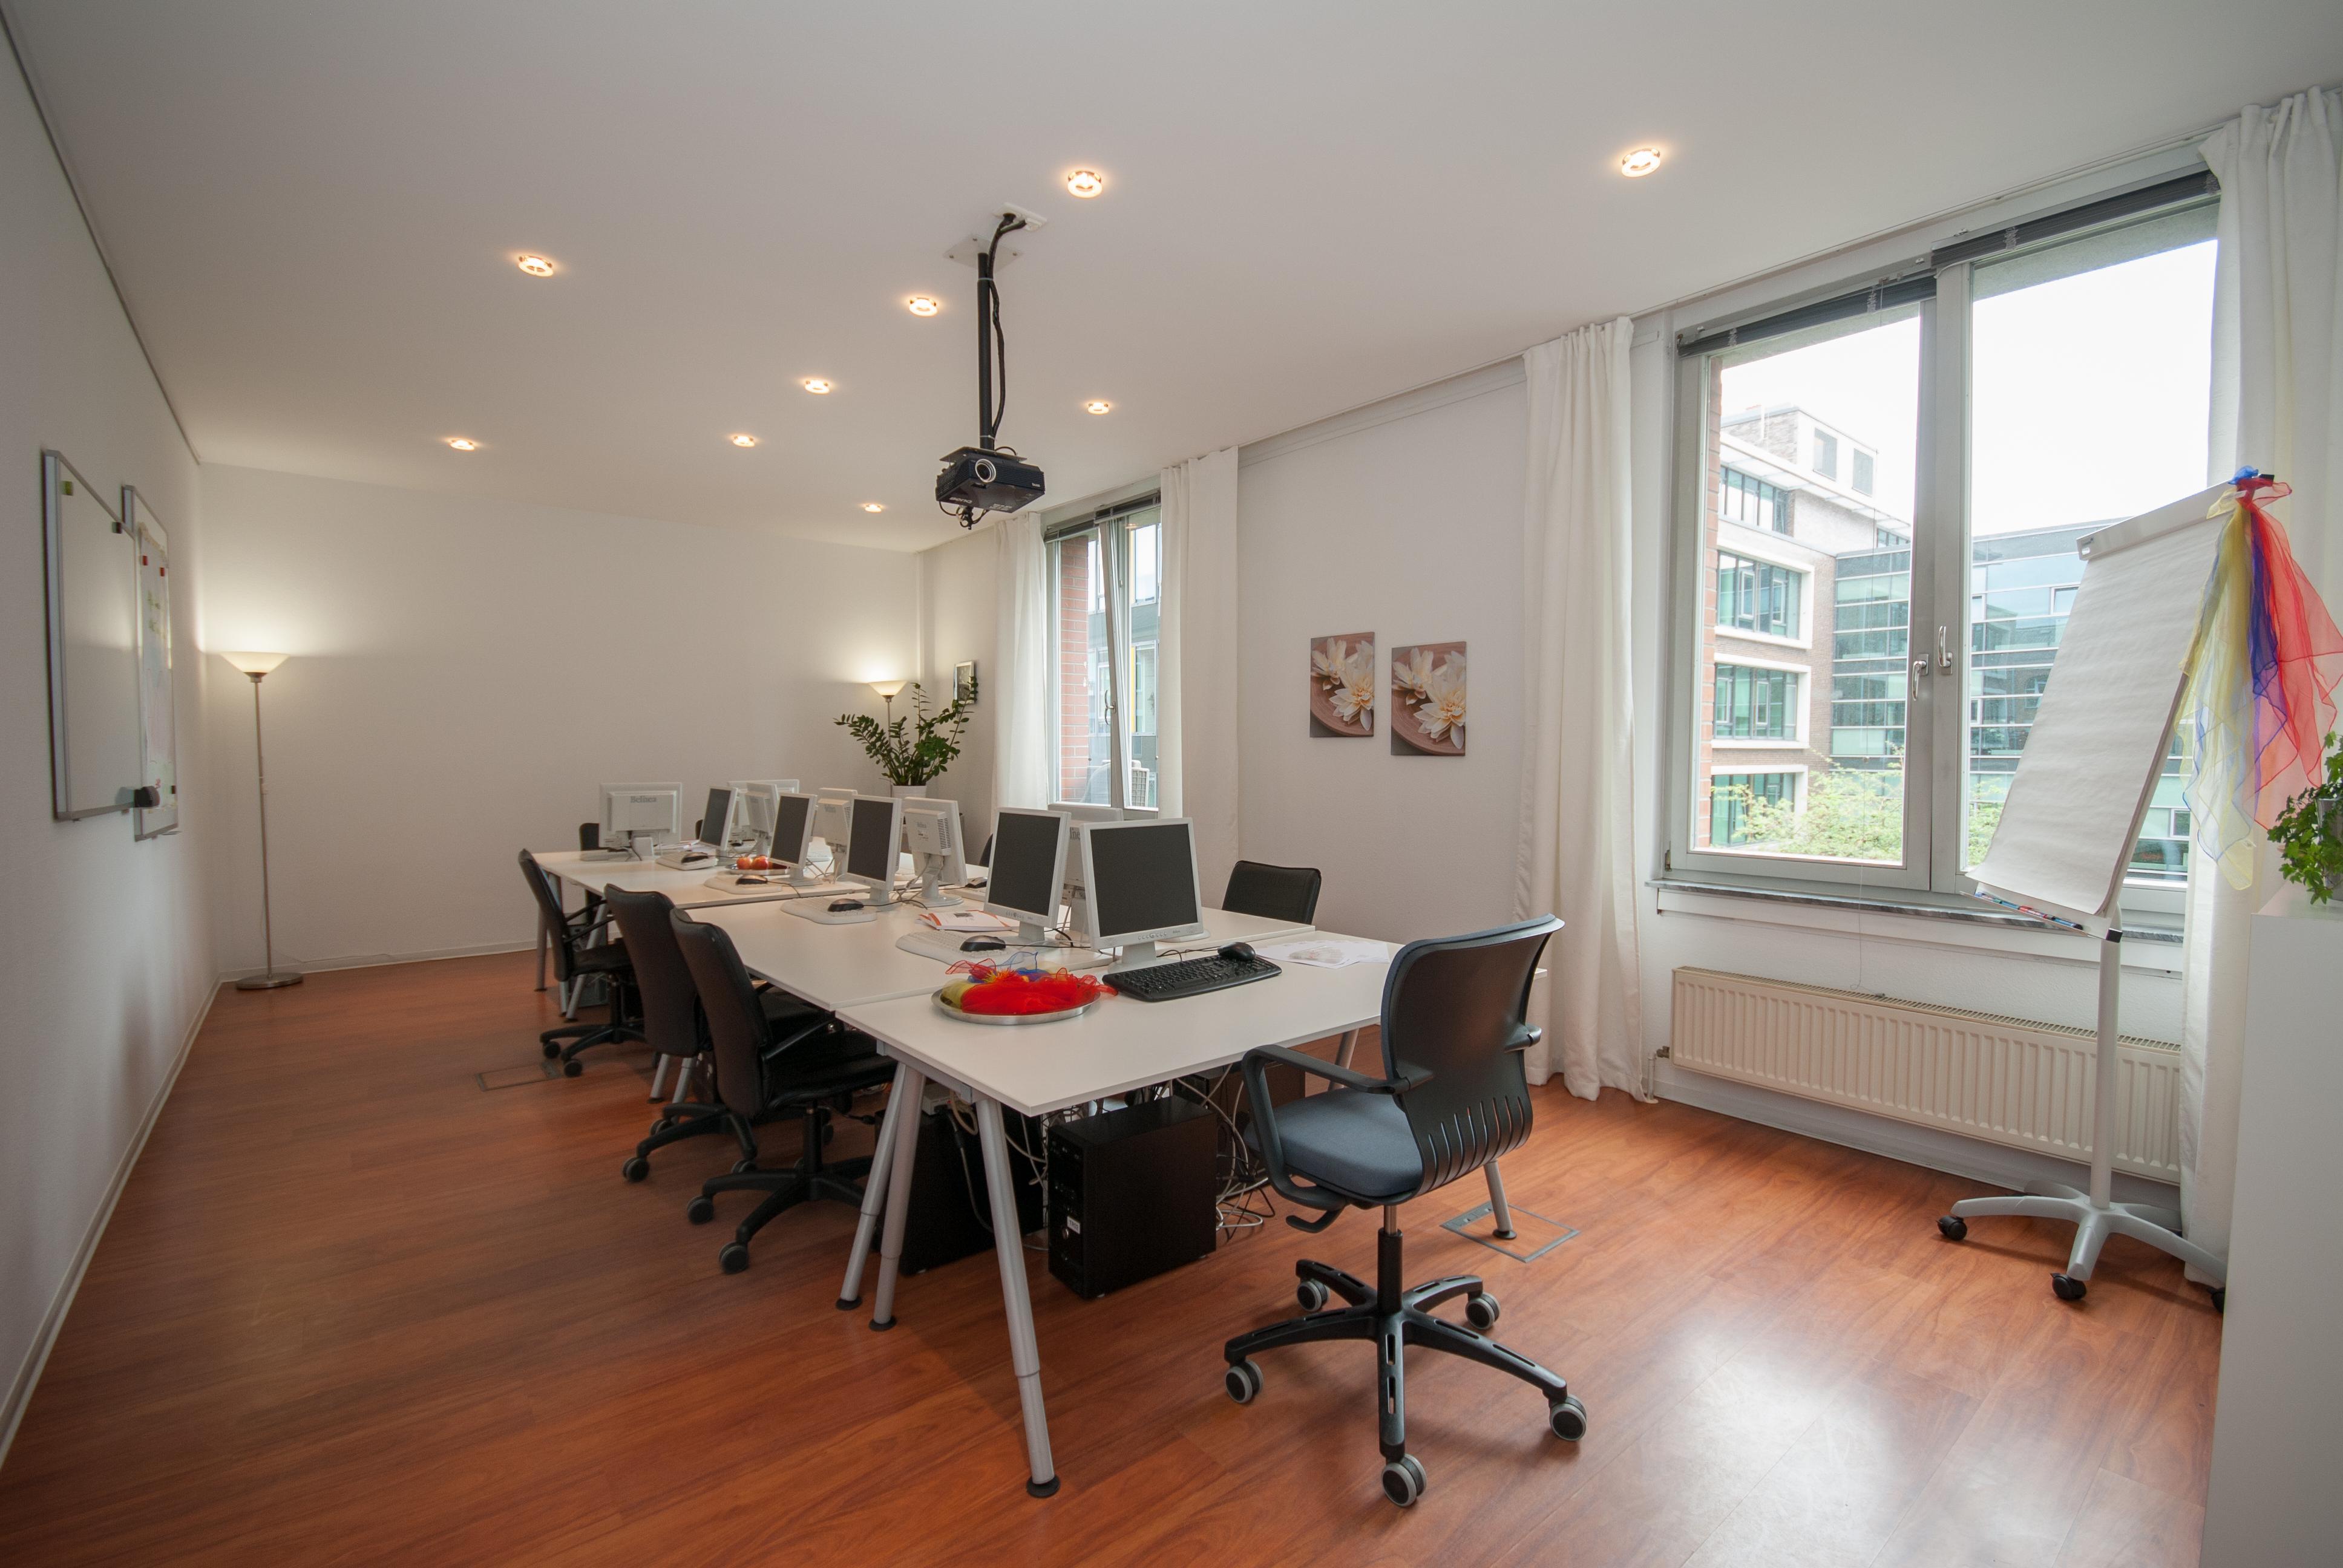 rosemond training consulting informatik personal. Black Bedroom Furniture Sets. Home Design Ideas